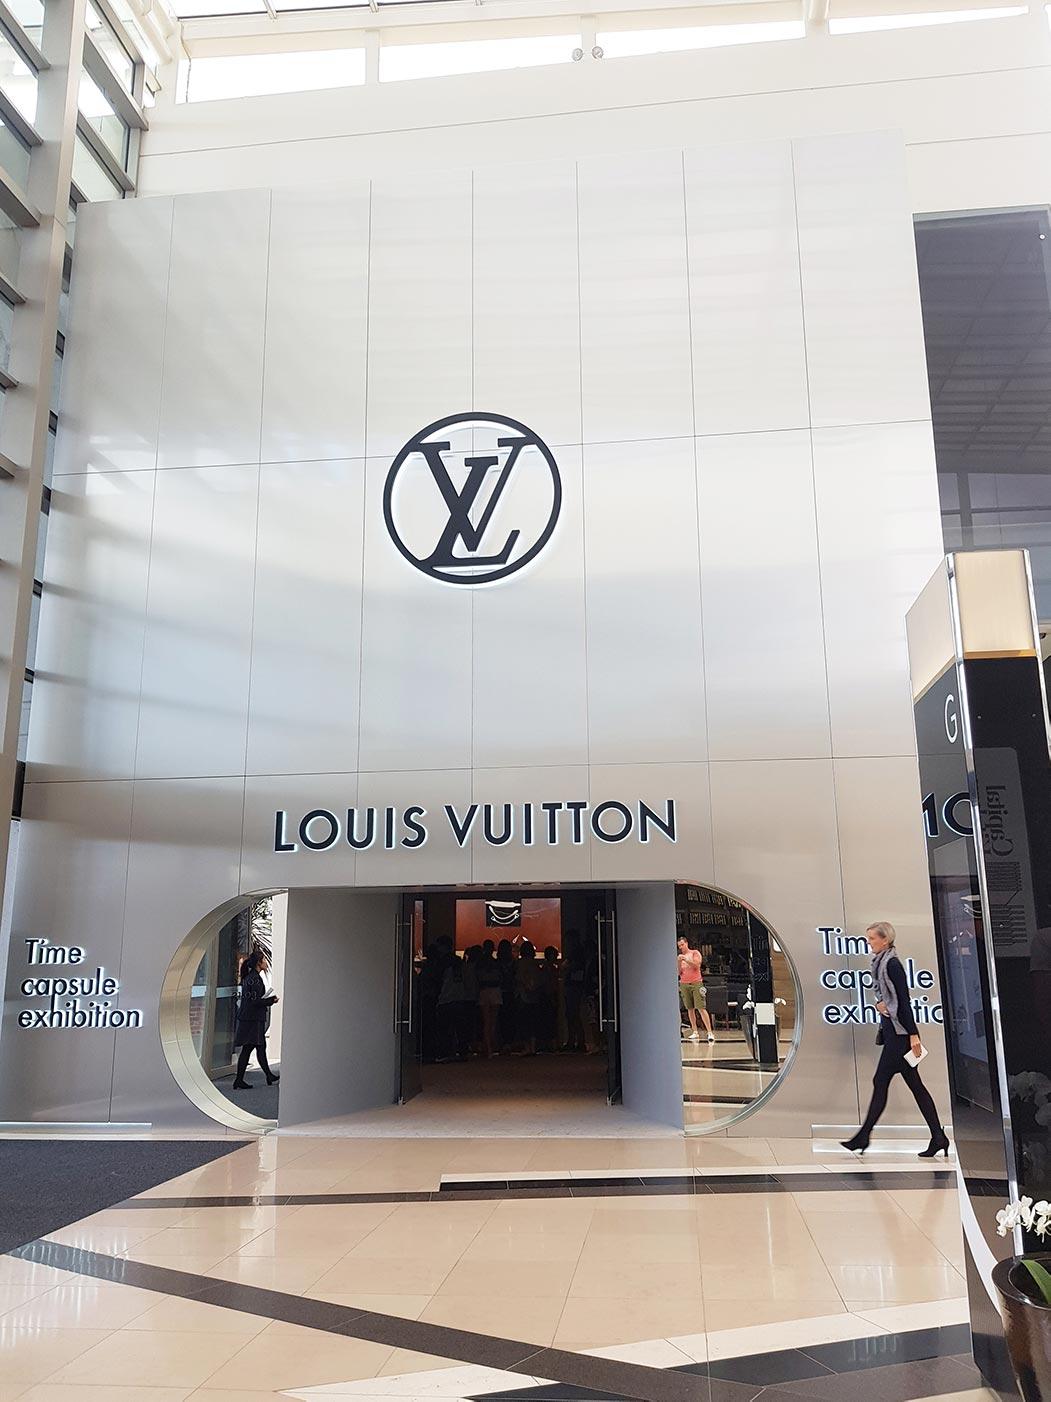 Louis-Vuitton-Australia.-larson-Illusions-Anodic-Brushed-Gloss_01-AD_1592407509.jpg